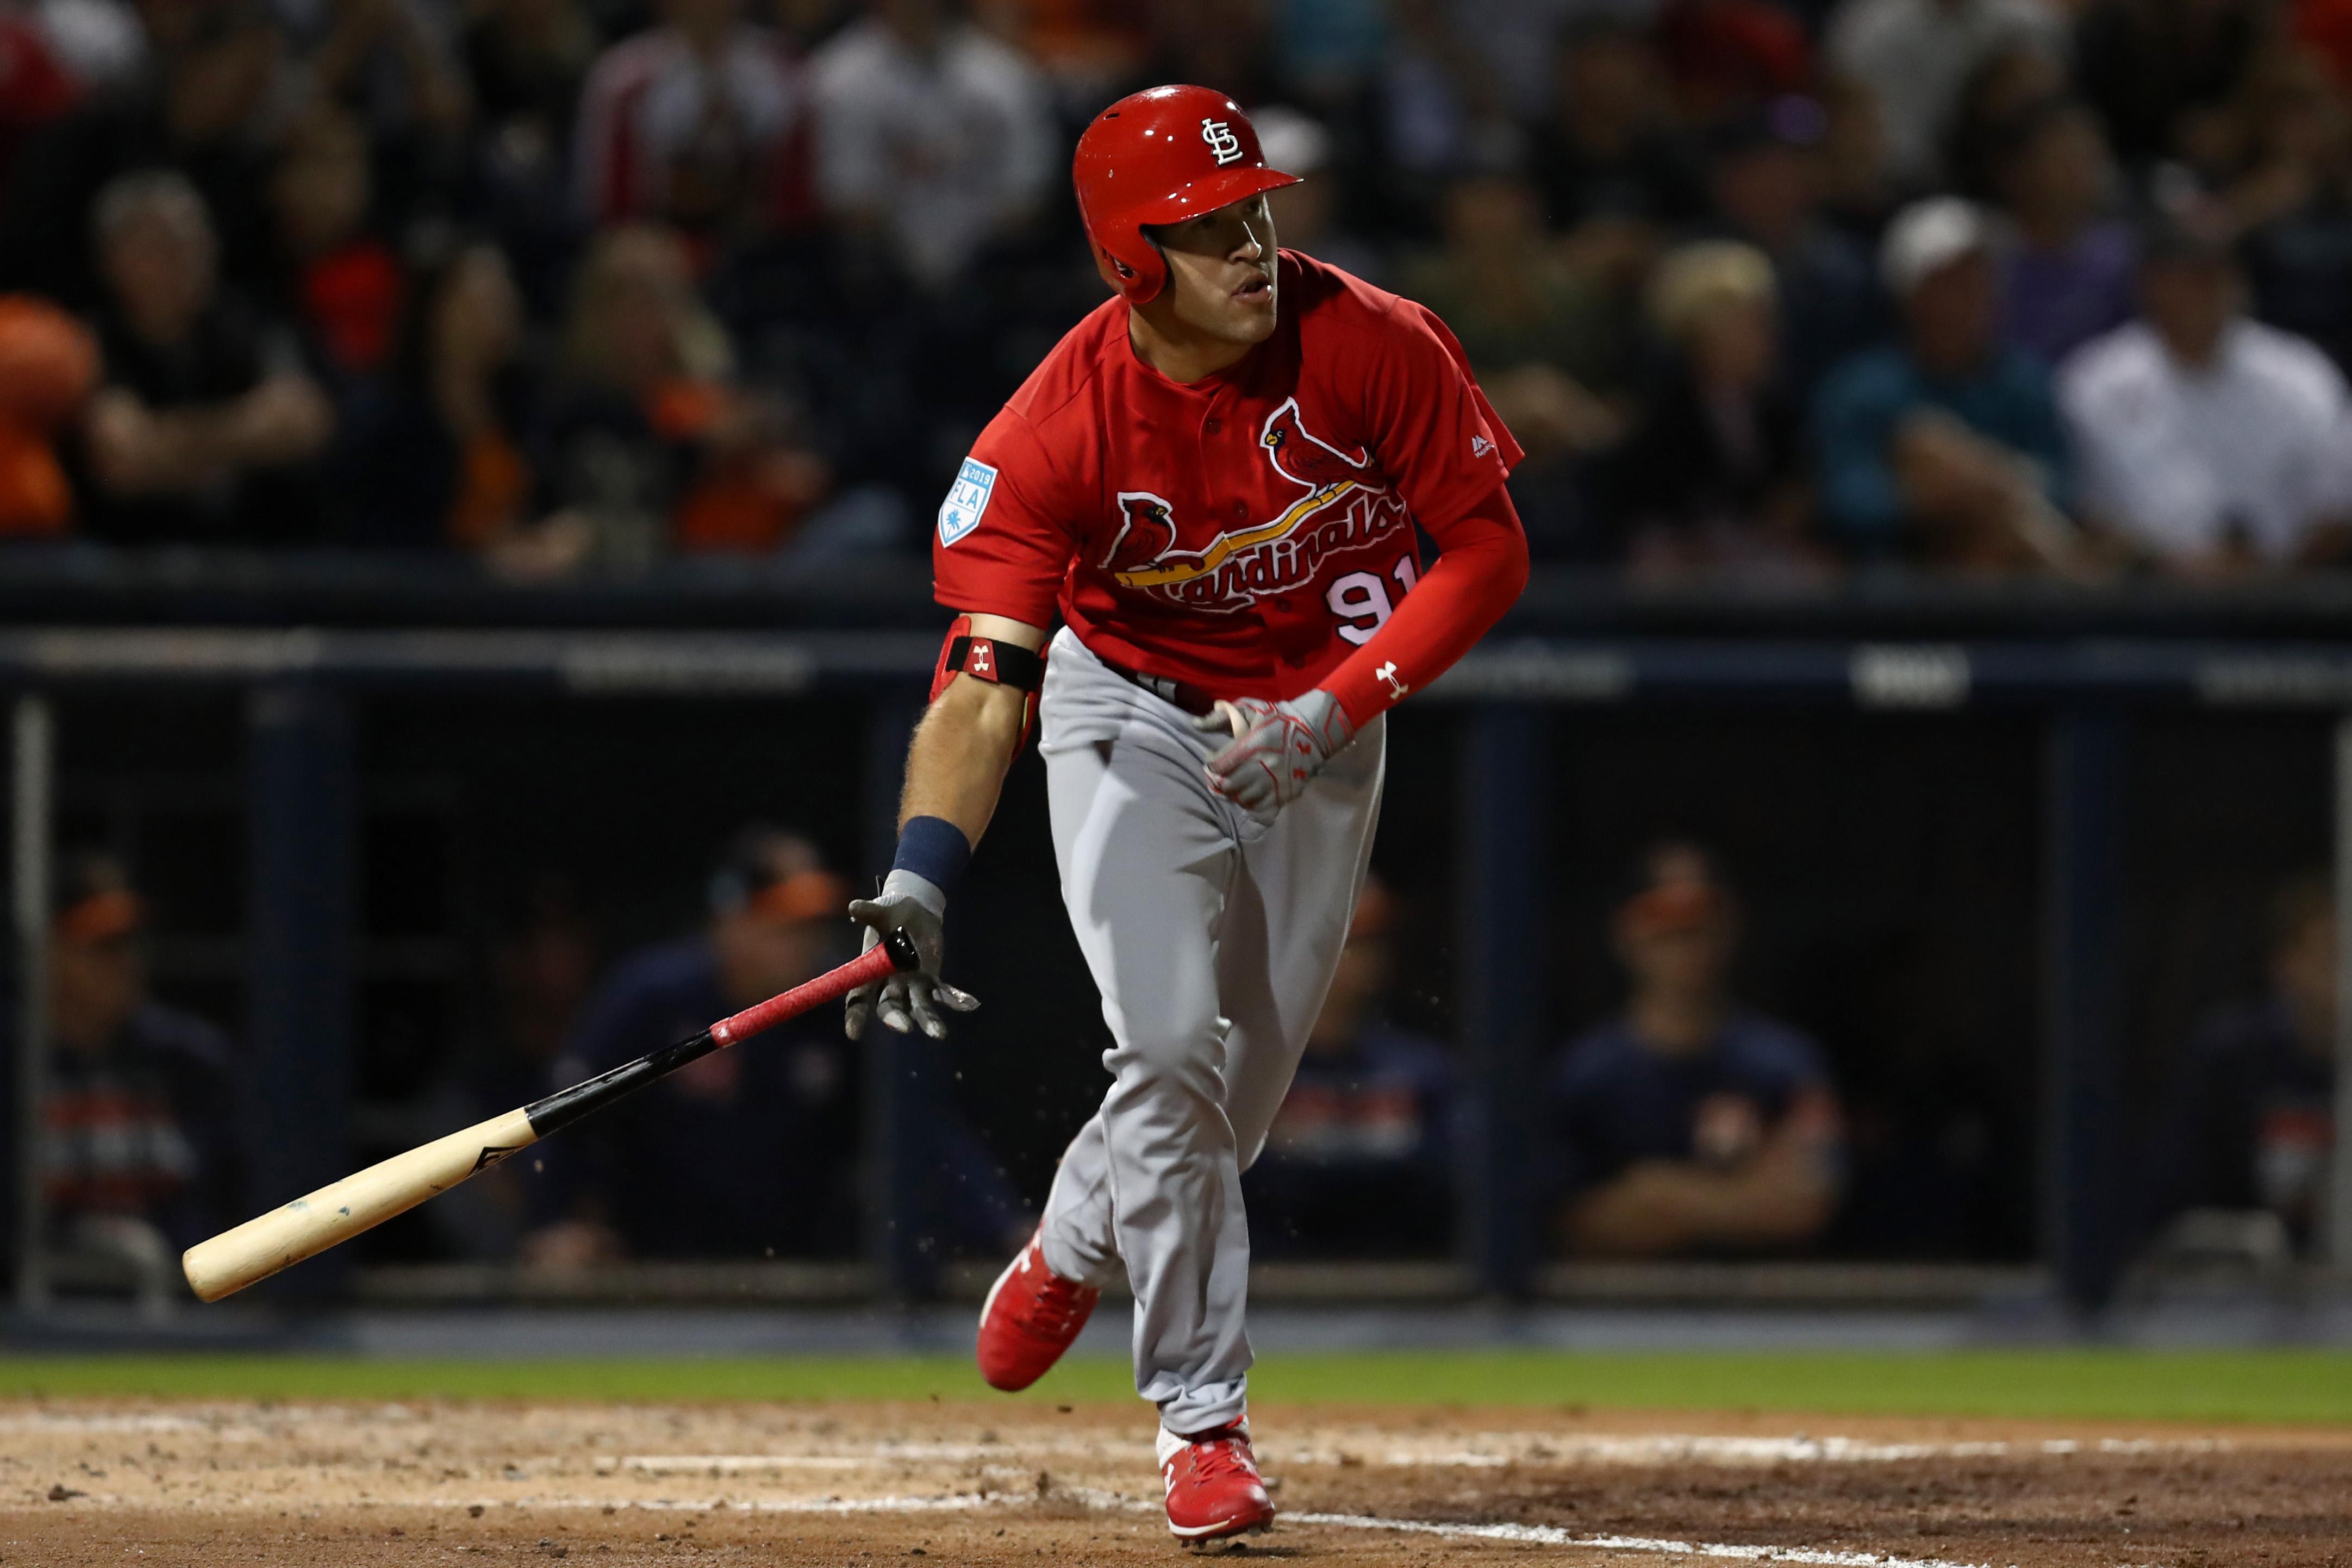 2020 Prospects: St. Louis Cardinals Top 10 Prospects - Baseball Prospectus